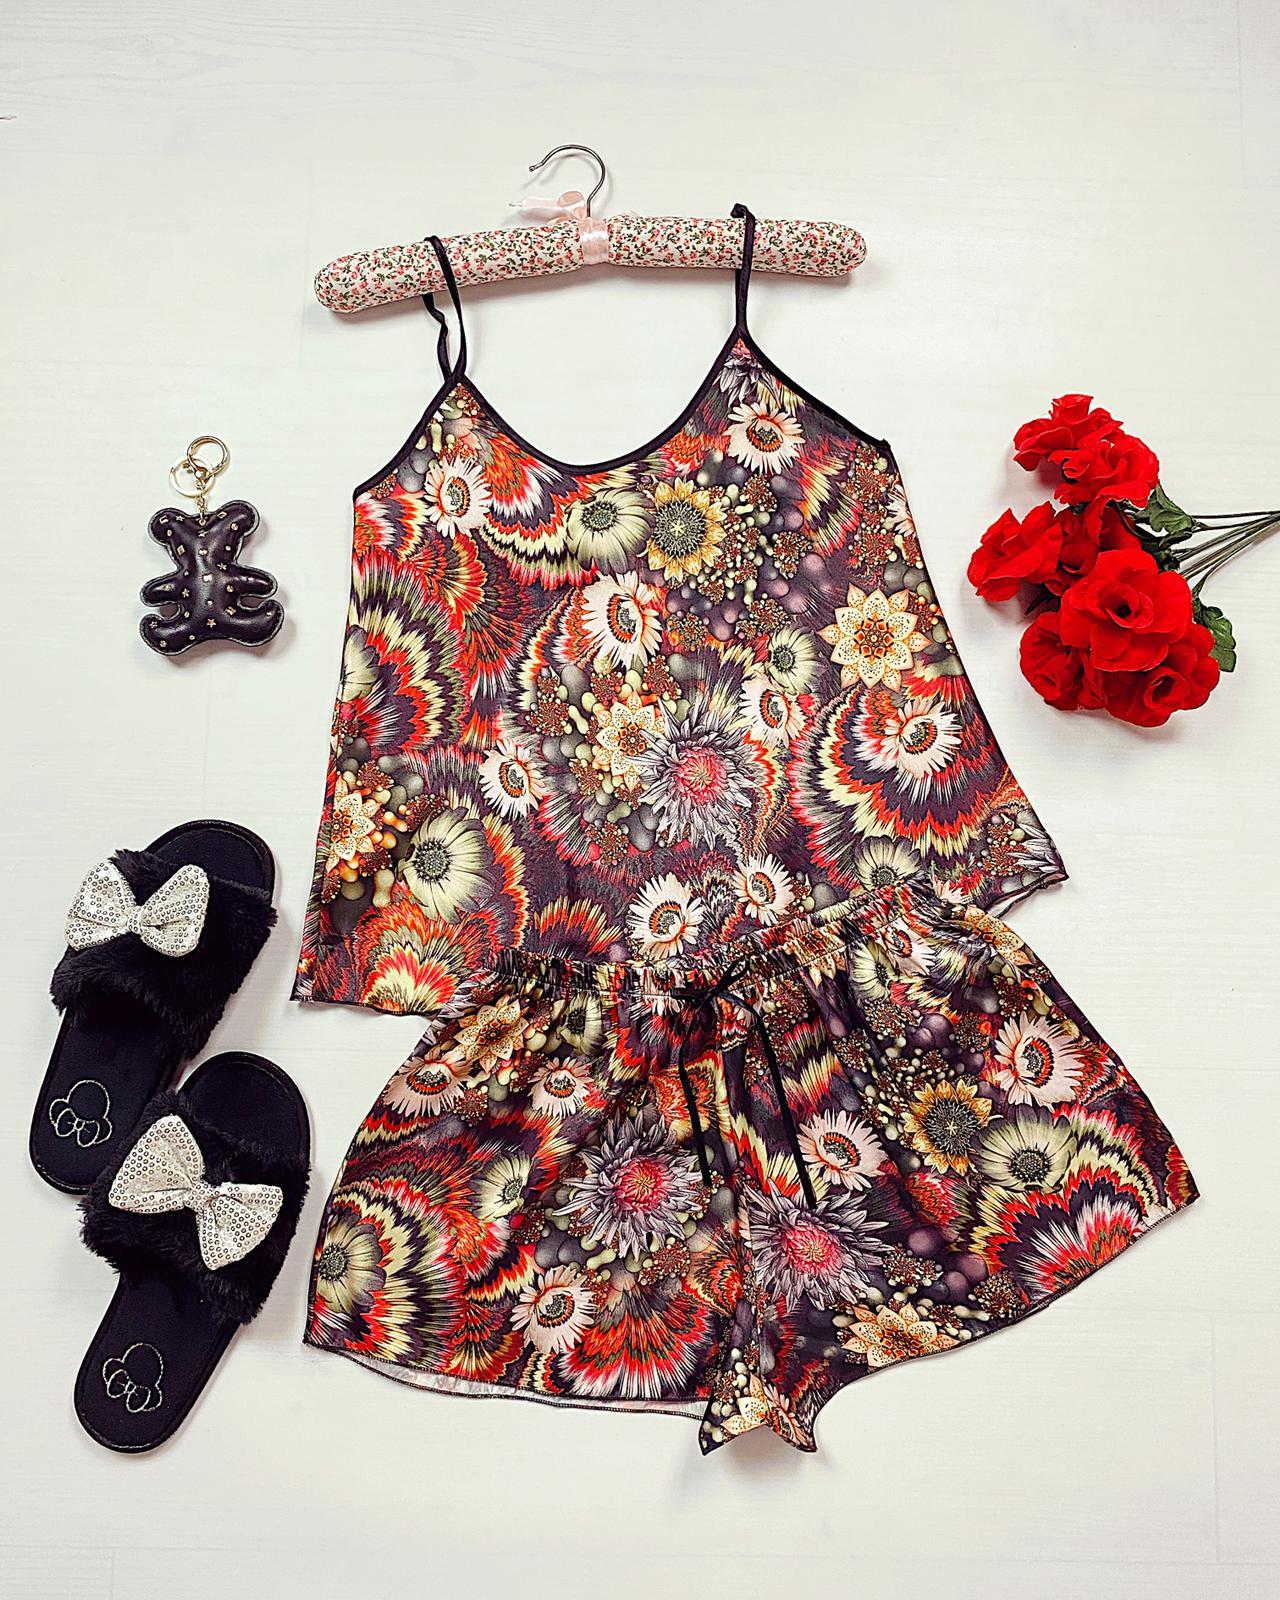 Compleu pijama scurt maro din satin cu imprimeu floral